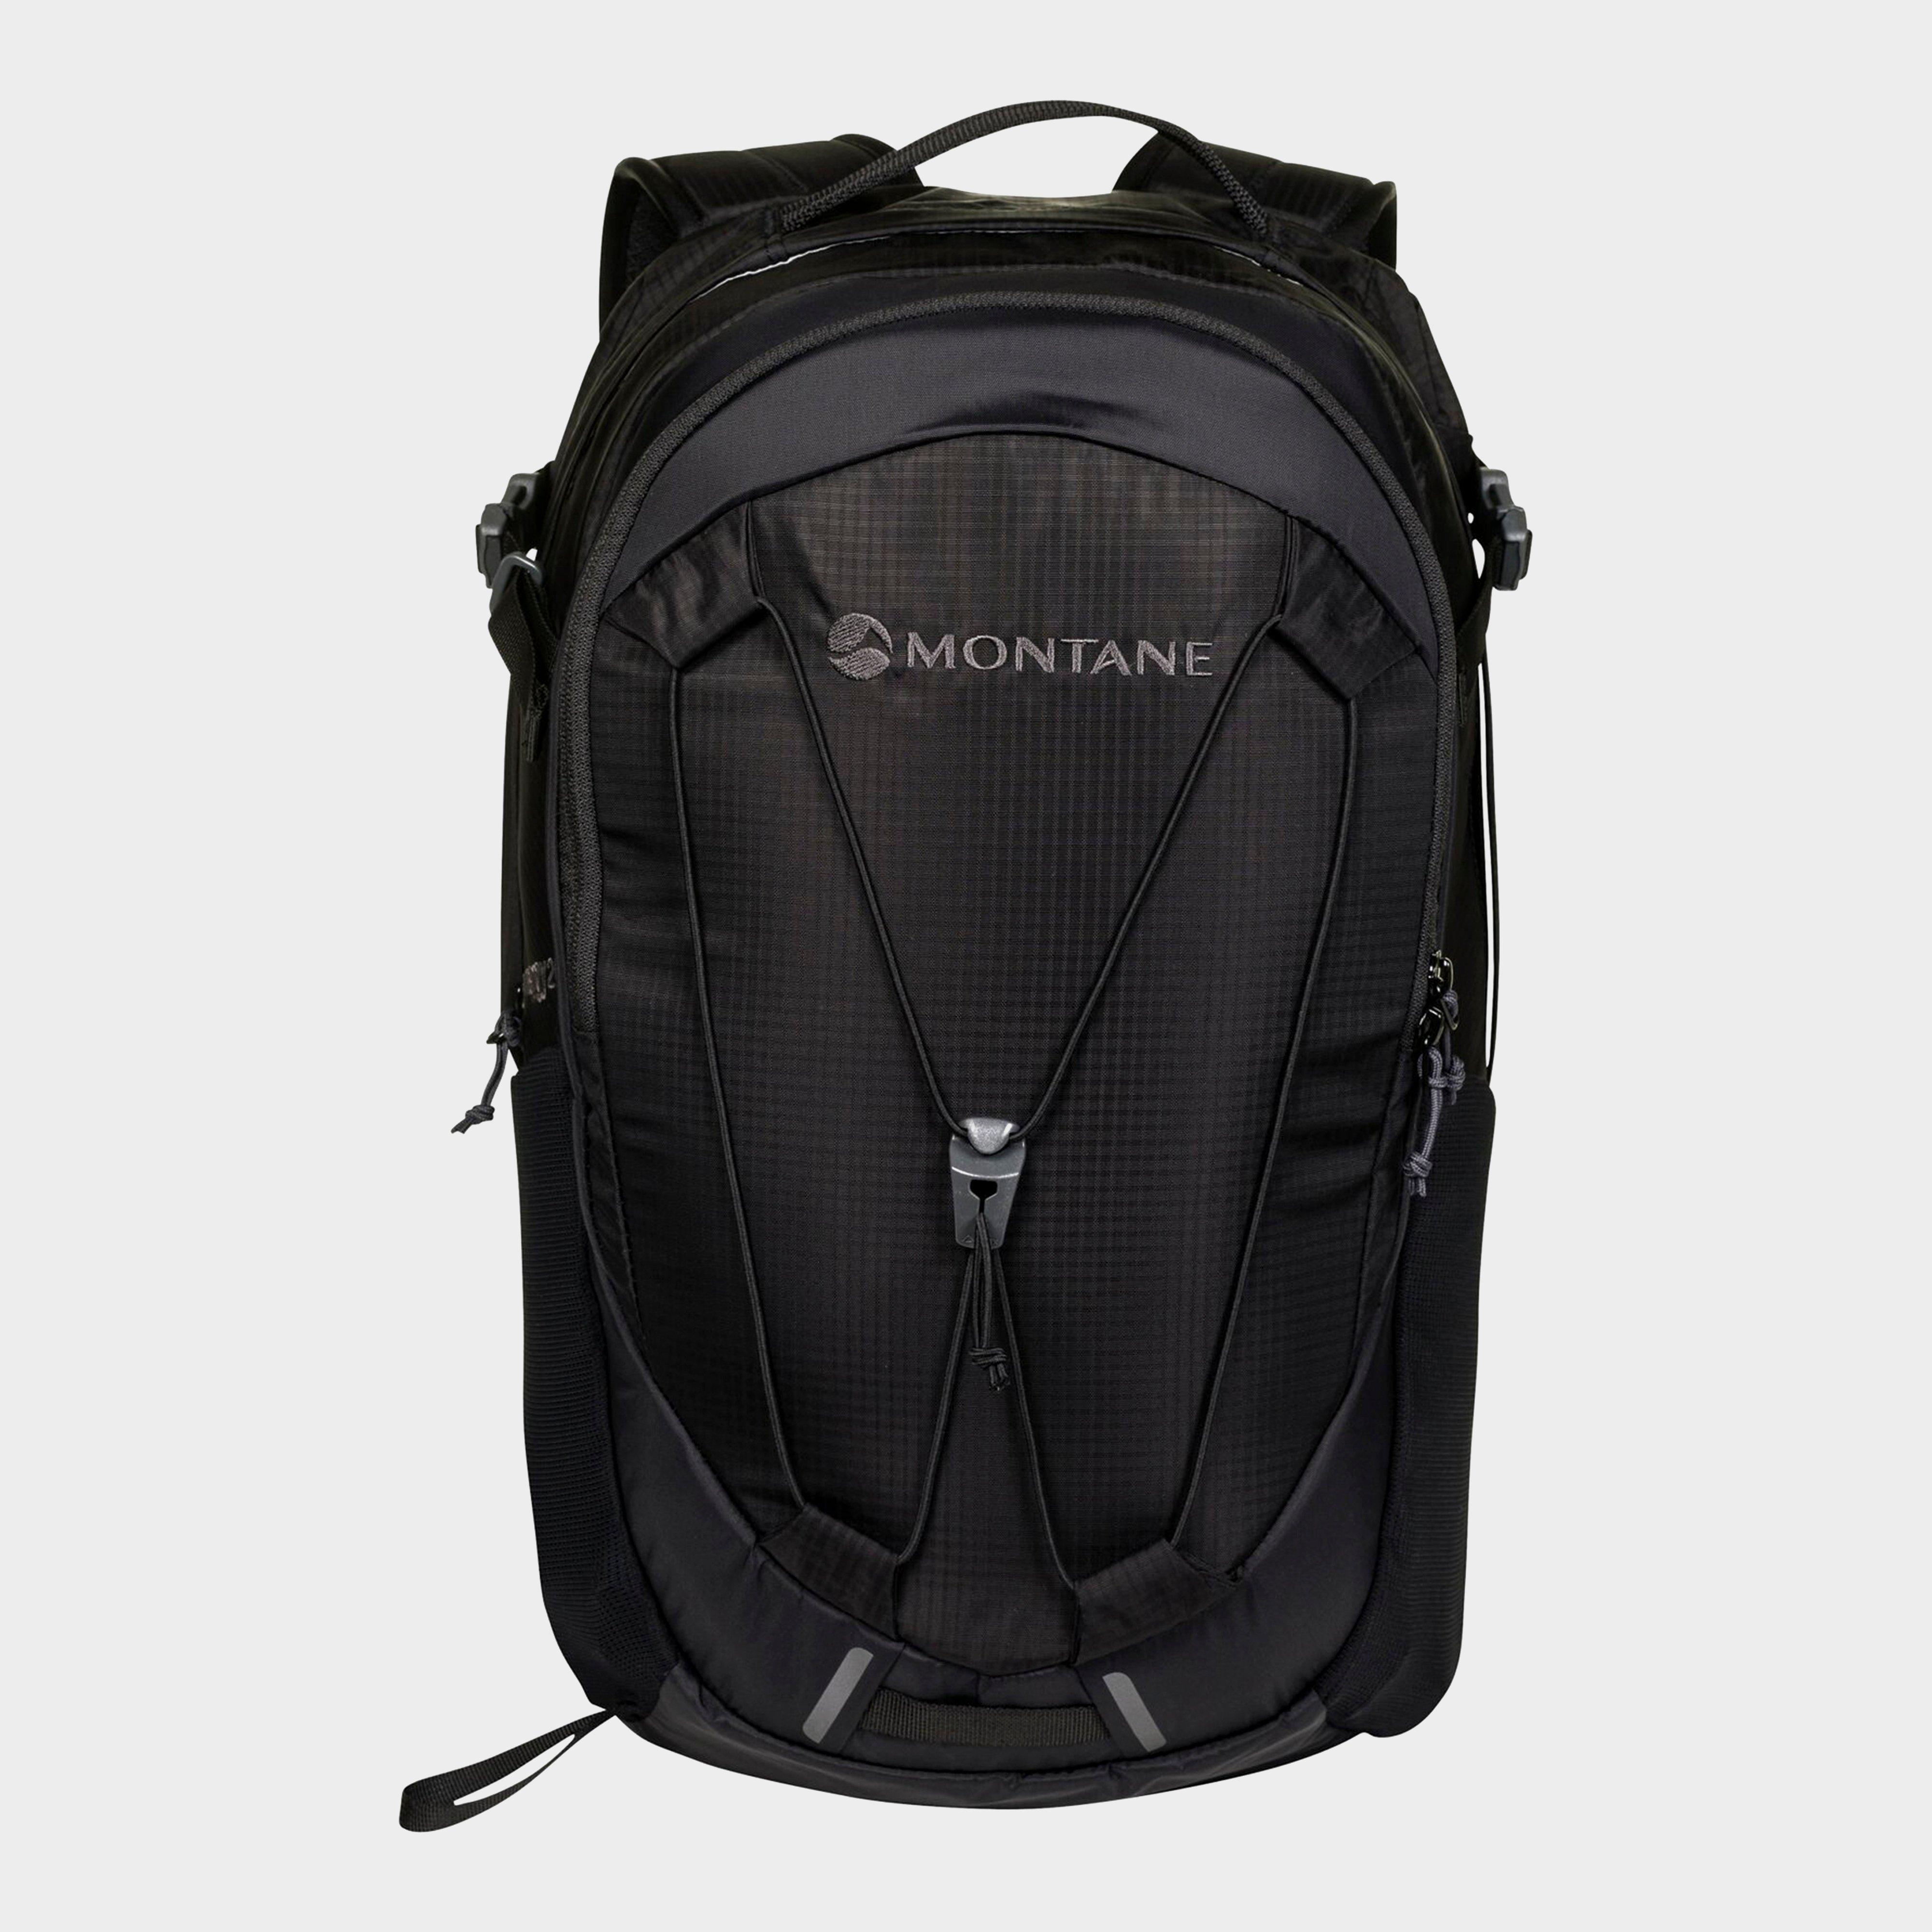 Montane Synergy 20L Backpack, Black